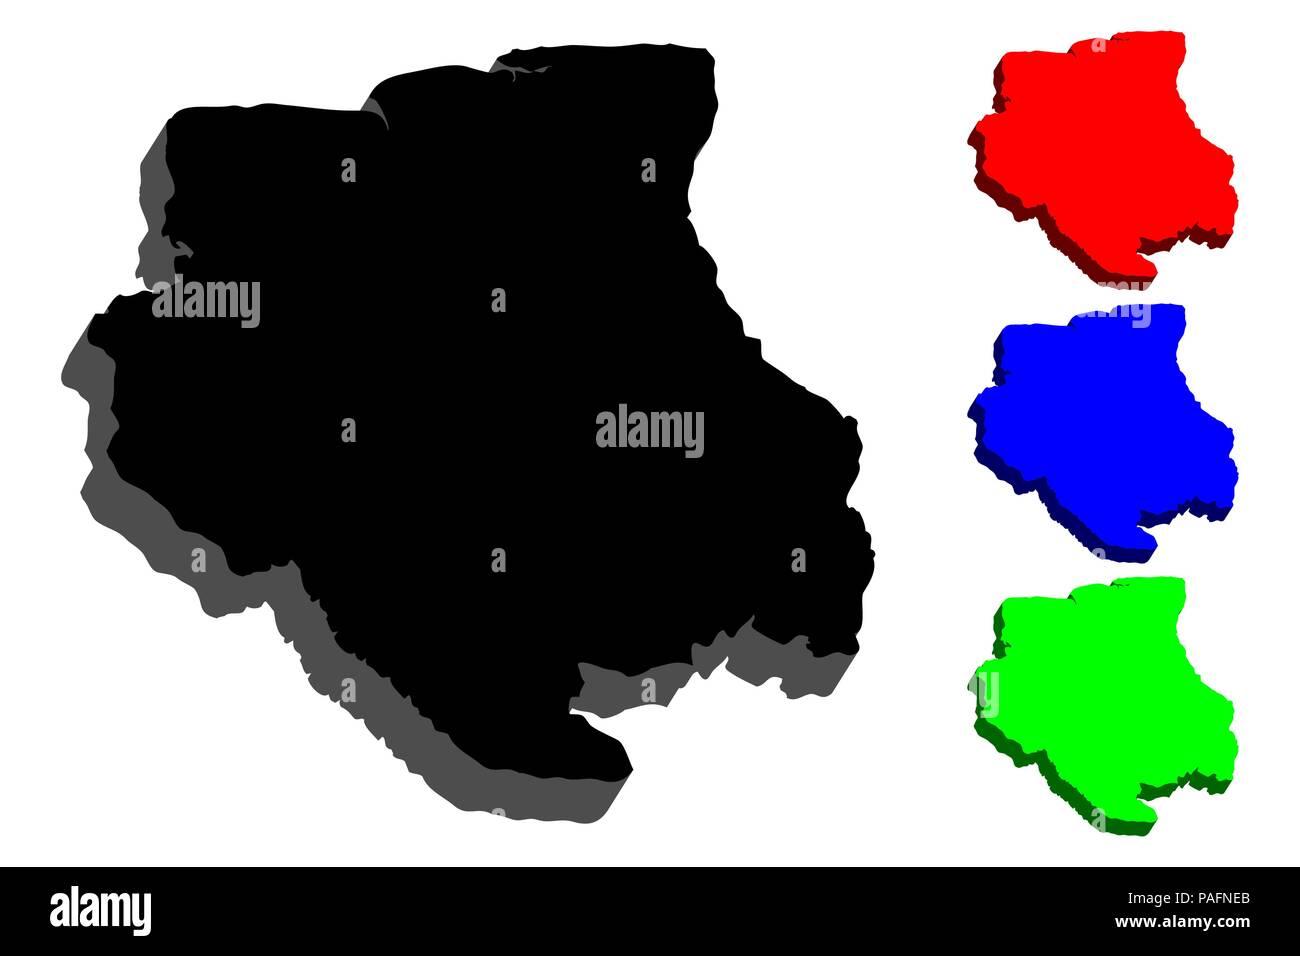 Surinam World Map.3d Map Of Suriname Republic Of Suriname Surinam Black Red